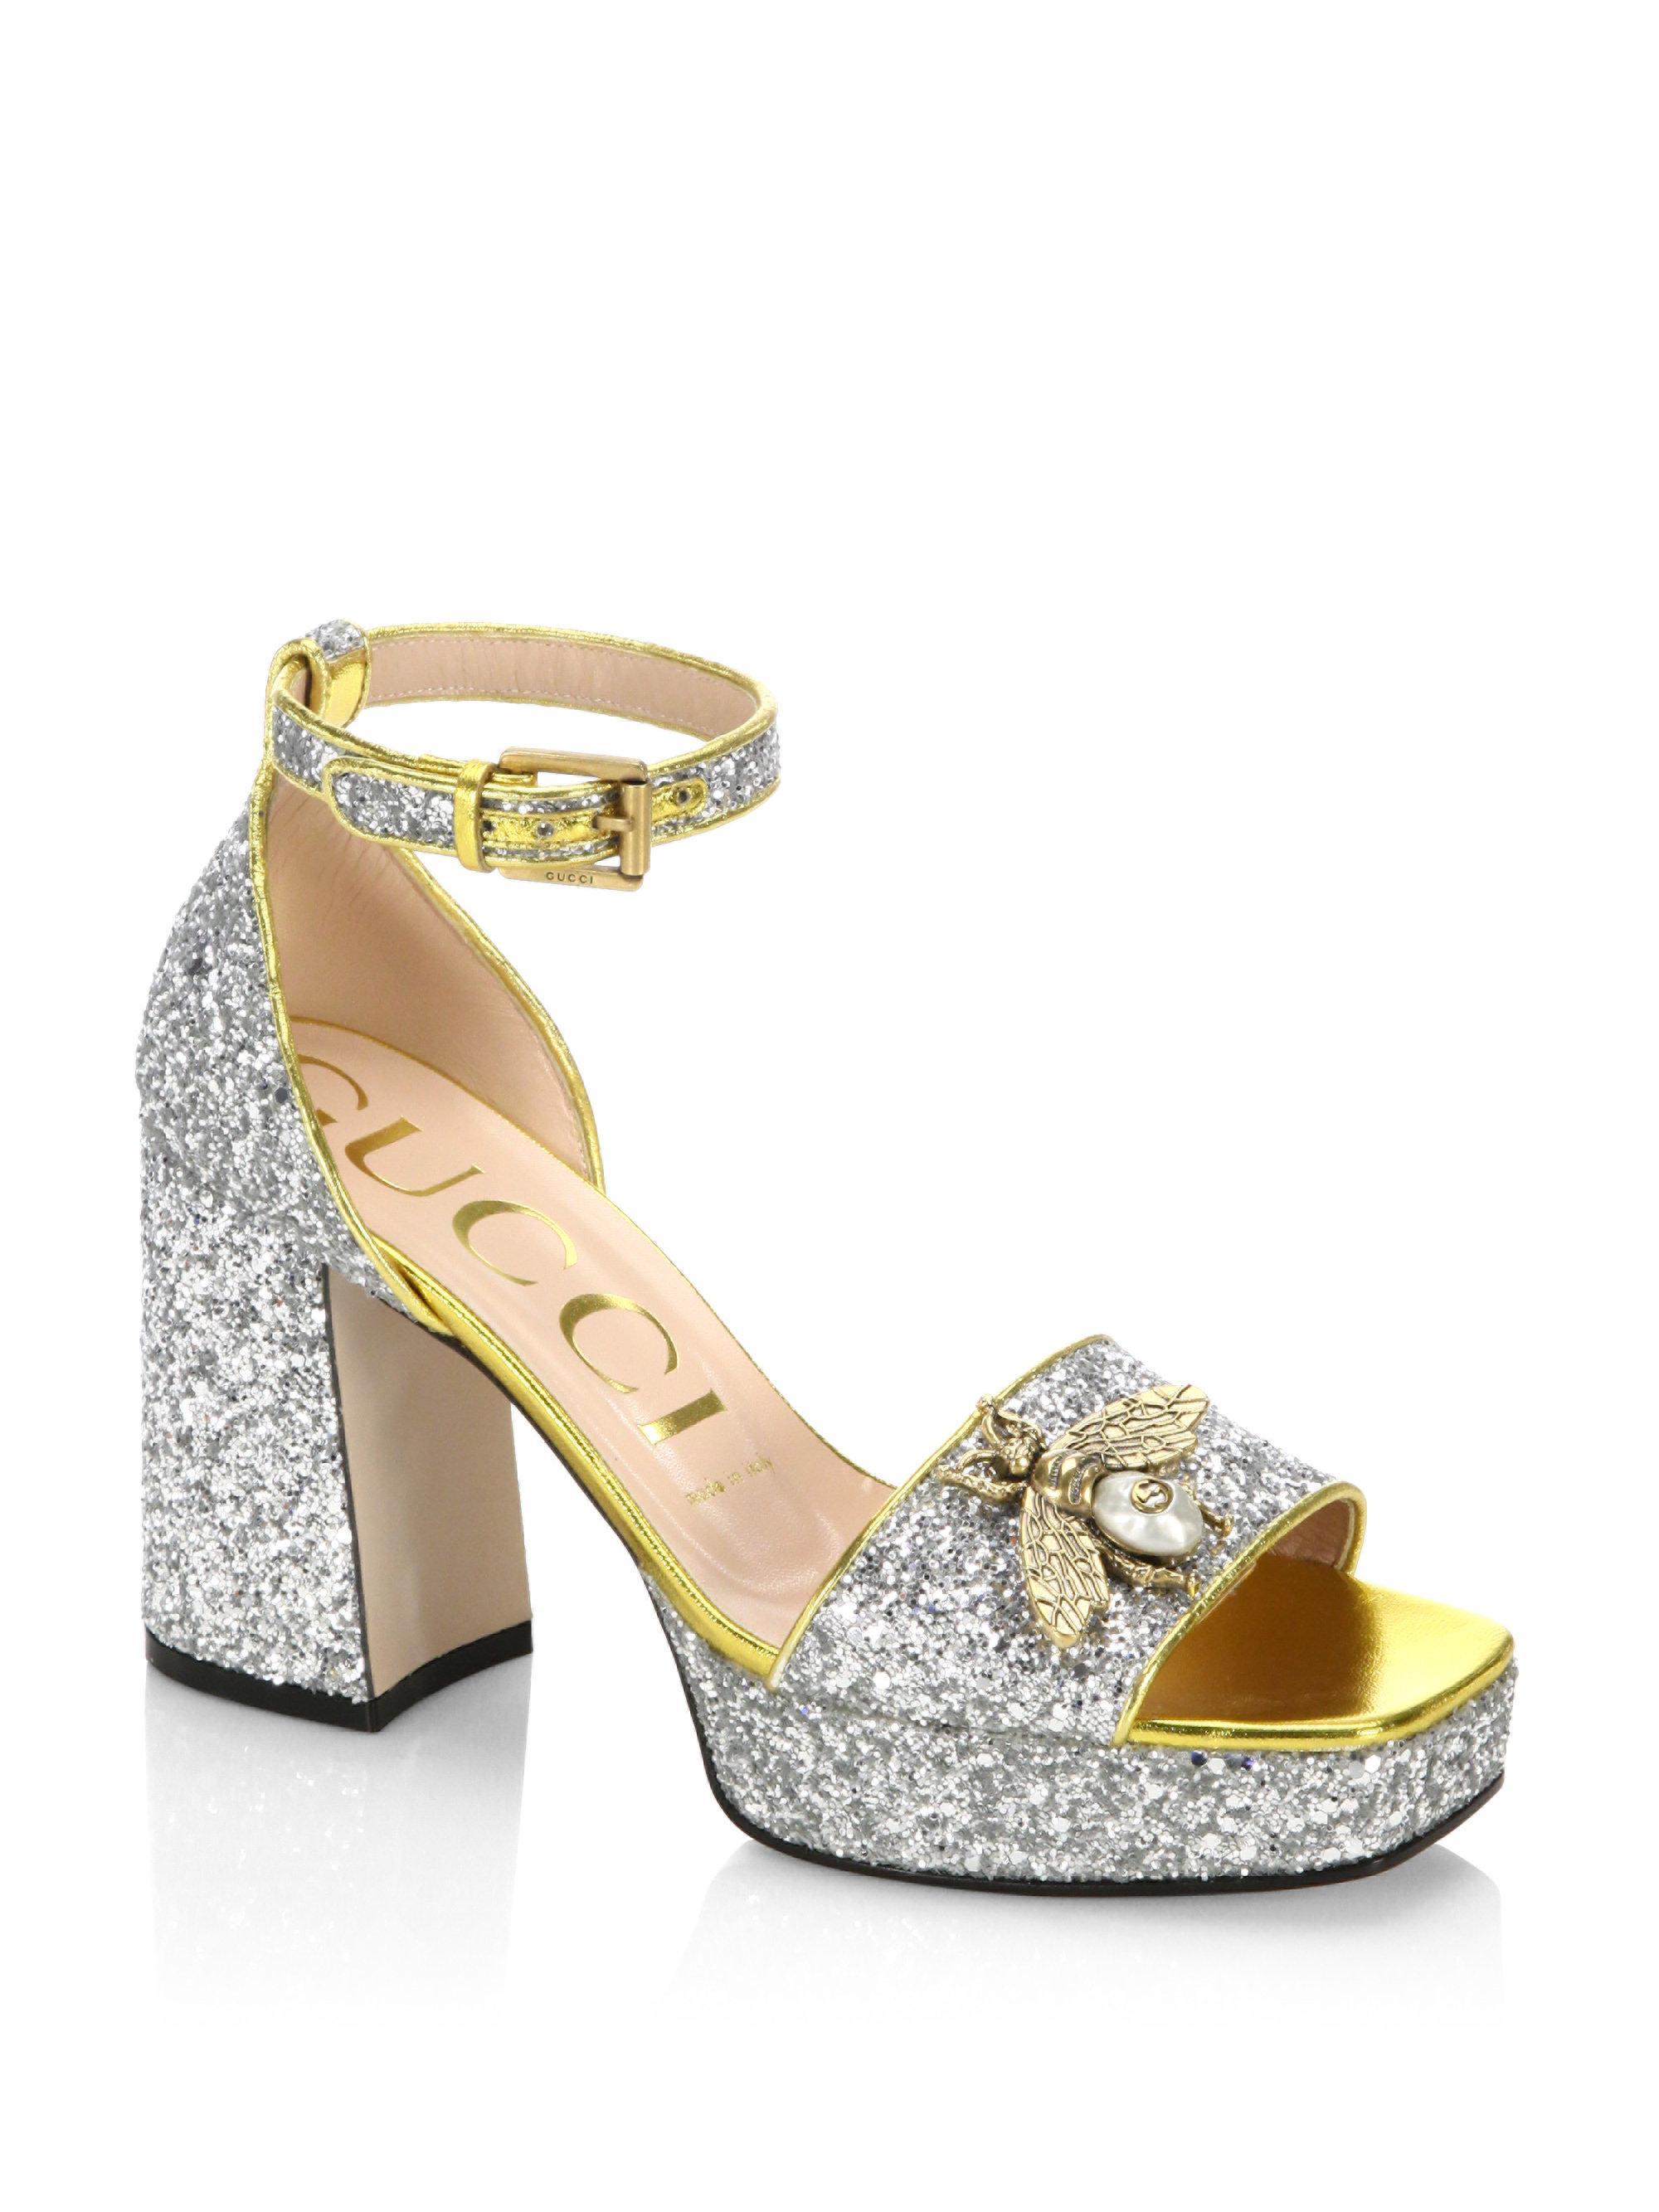 9f7499726a53 Gucci Soko Glitter Sandals in Metallic - Lyst